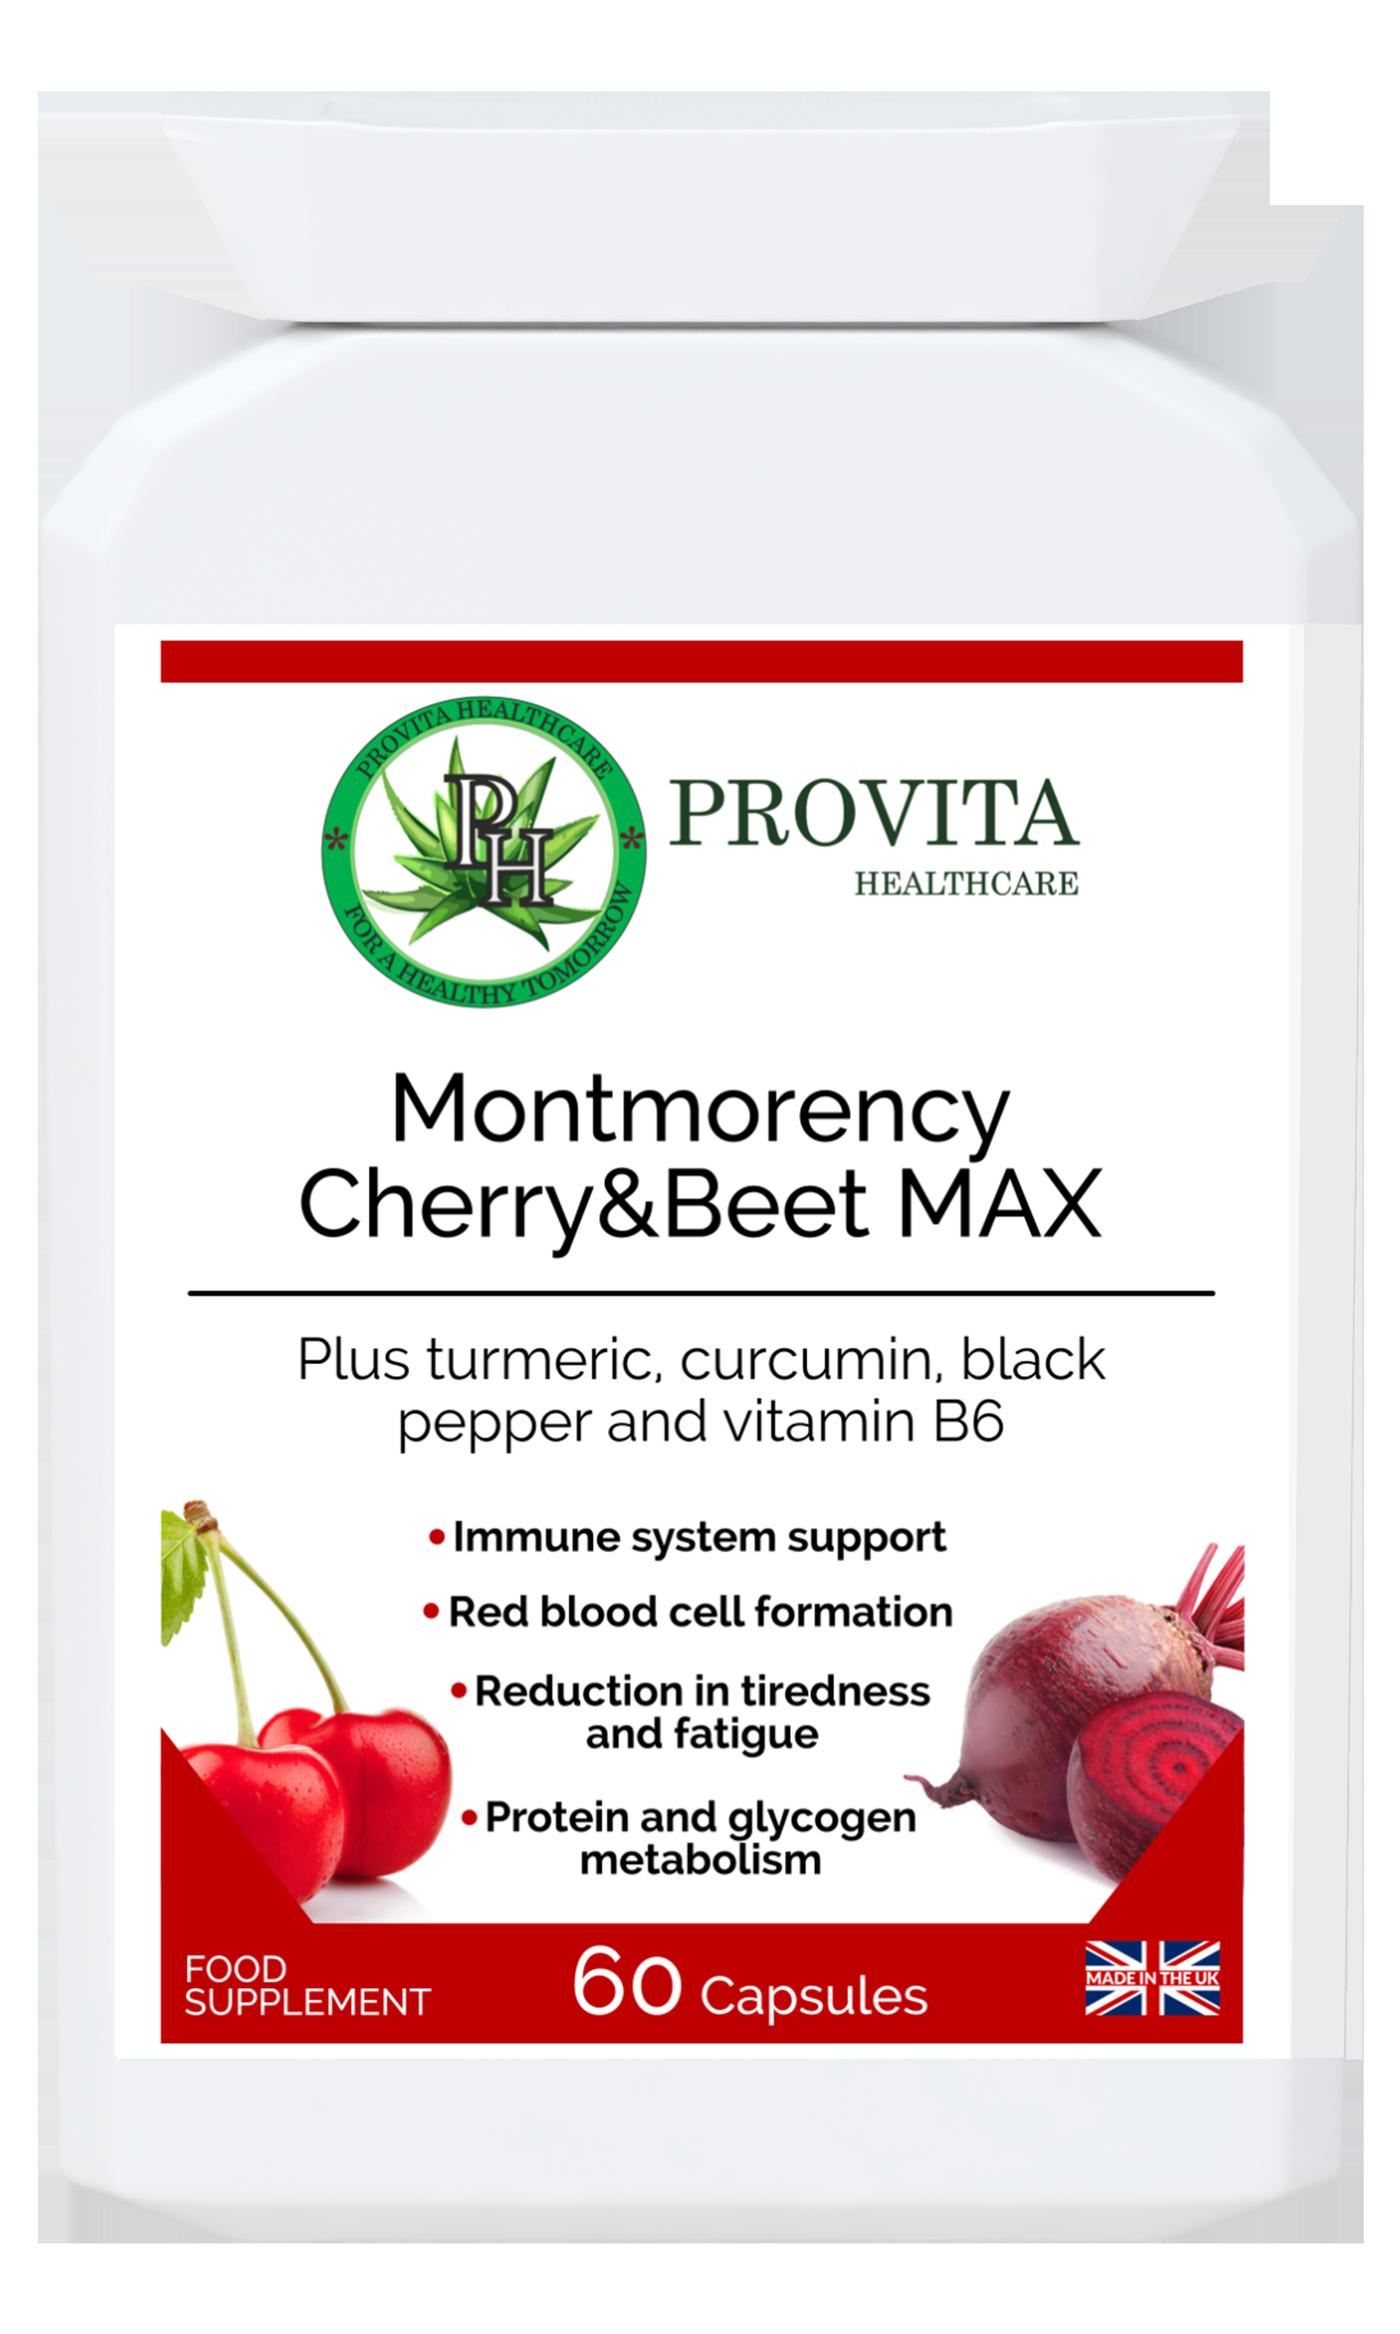 Montmorency Cherry&Beet MAX